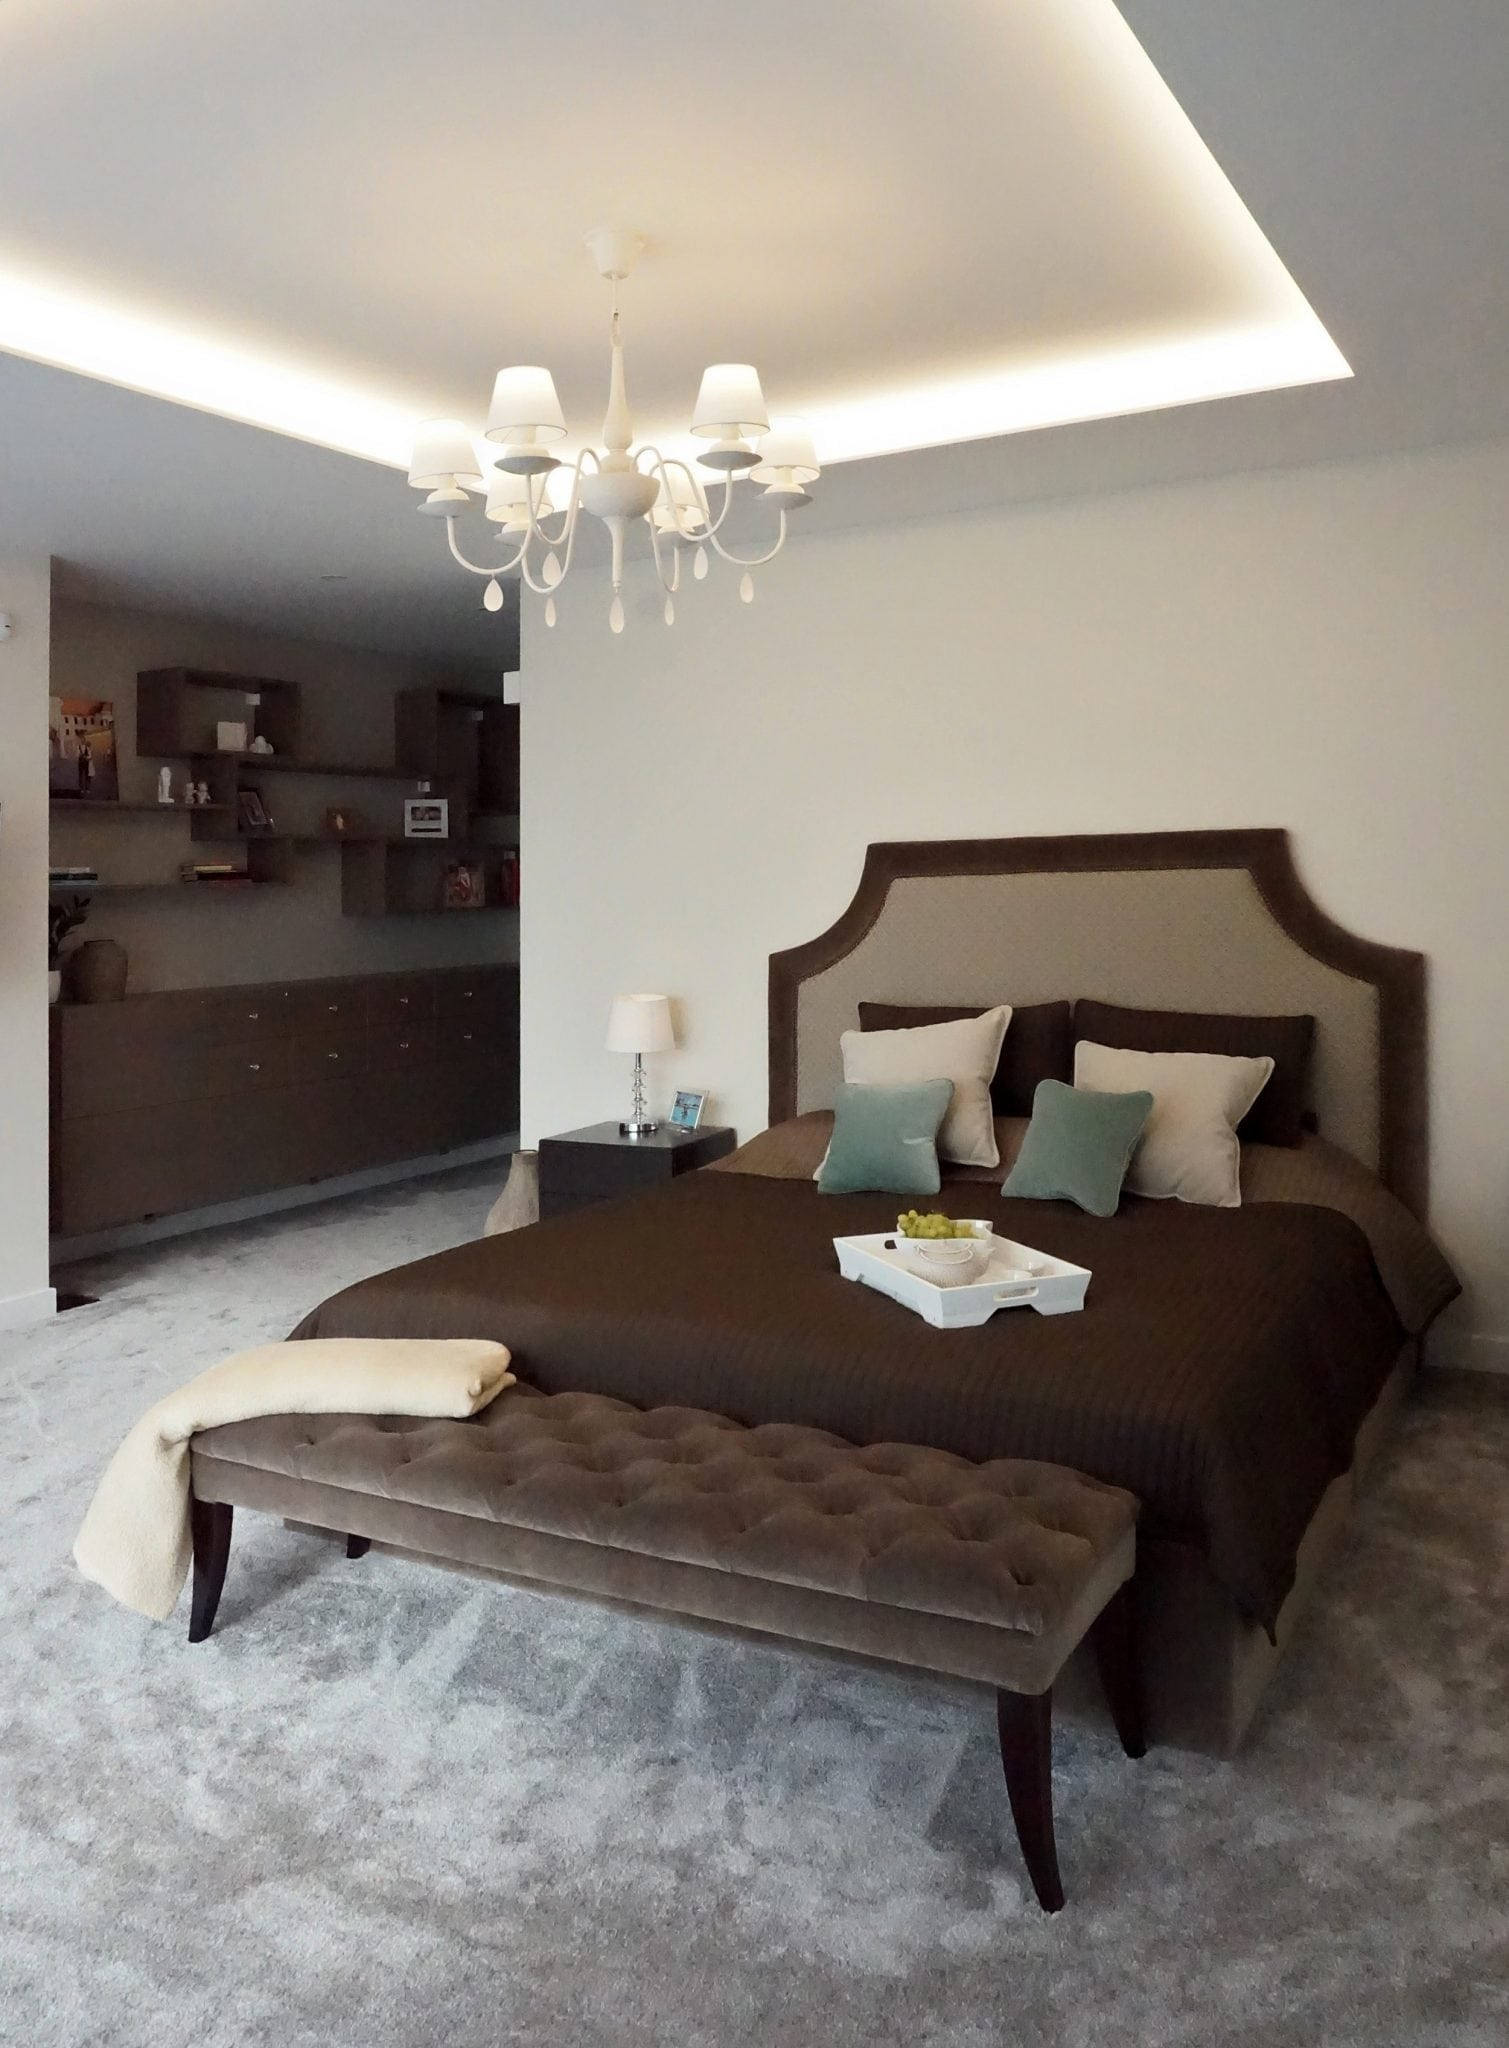 Moderni klasika miegamojo baldu gamyba